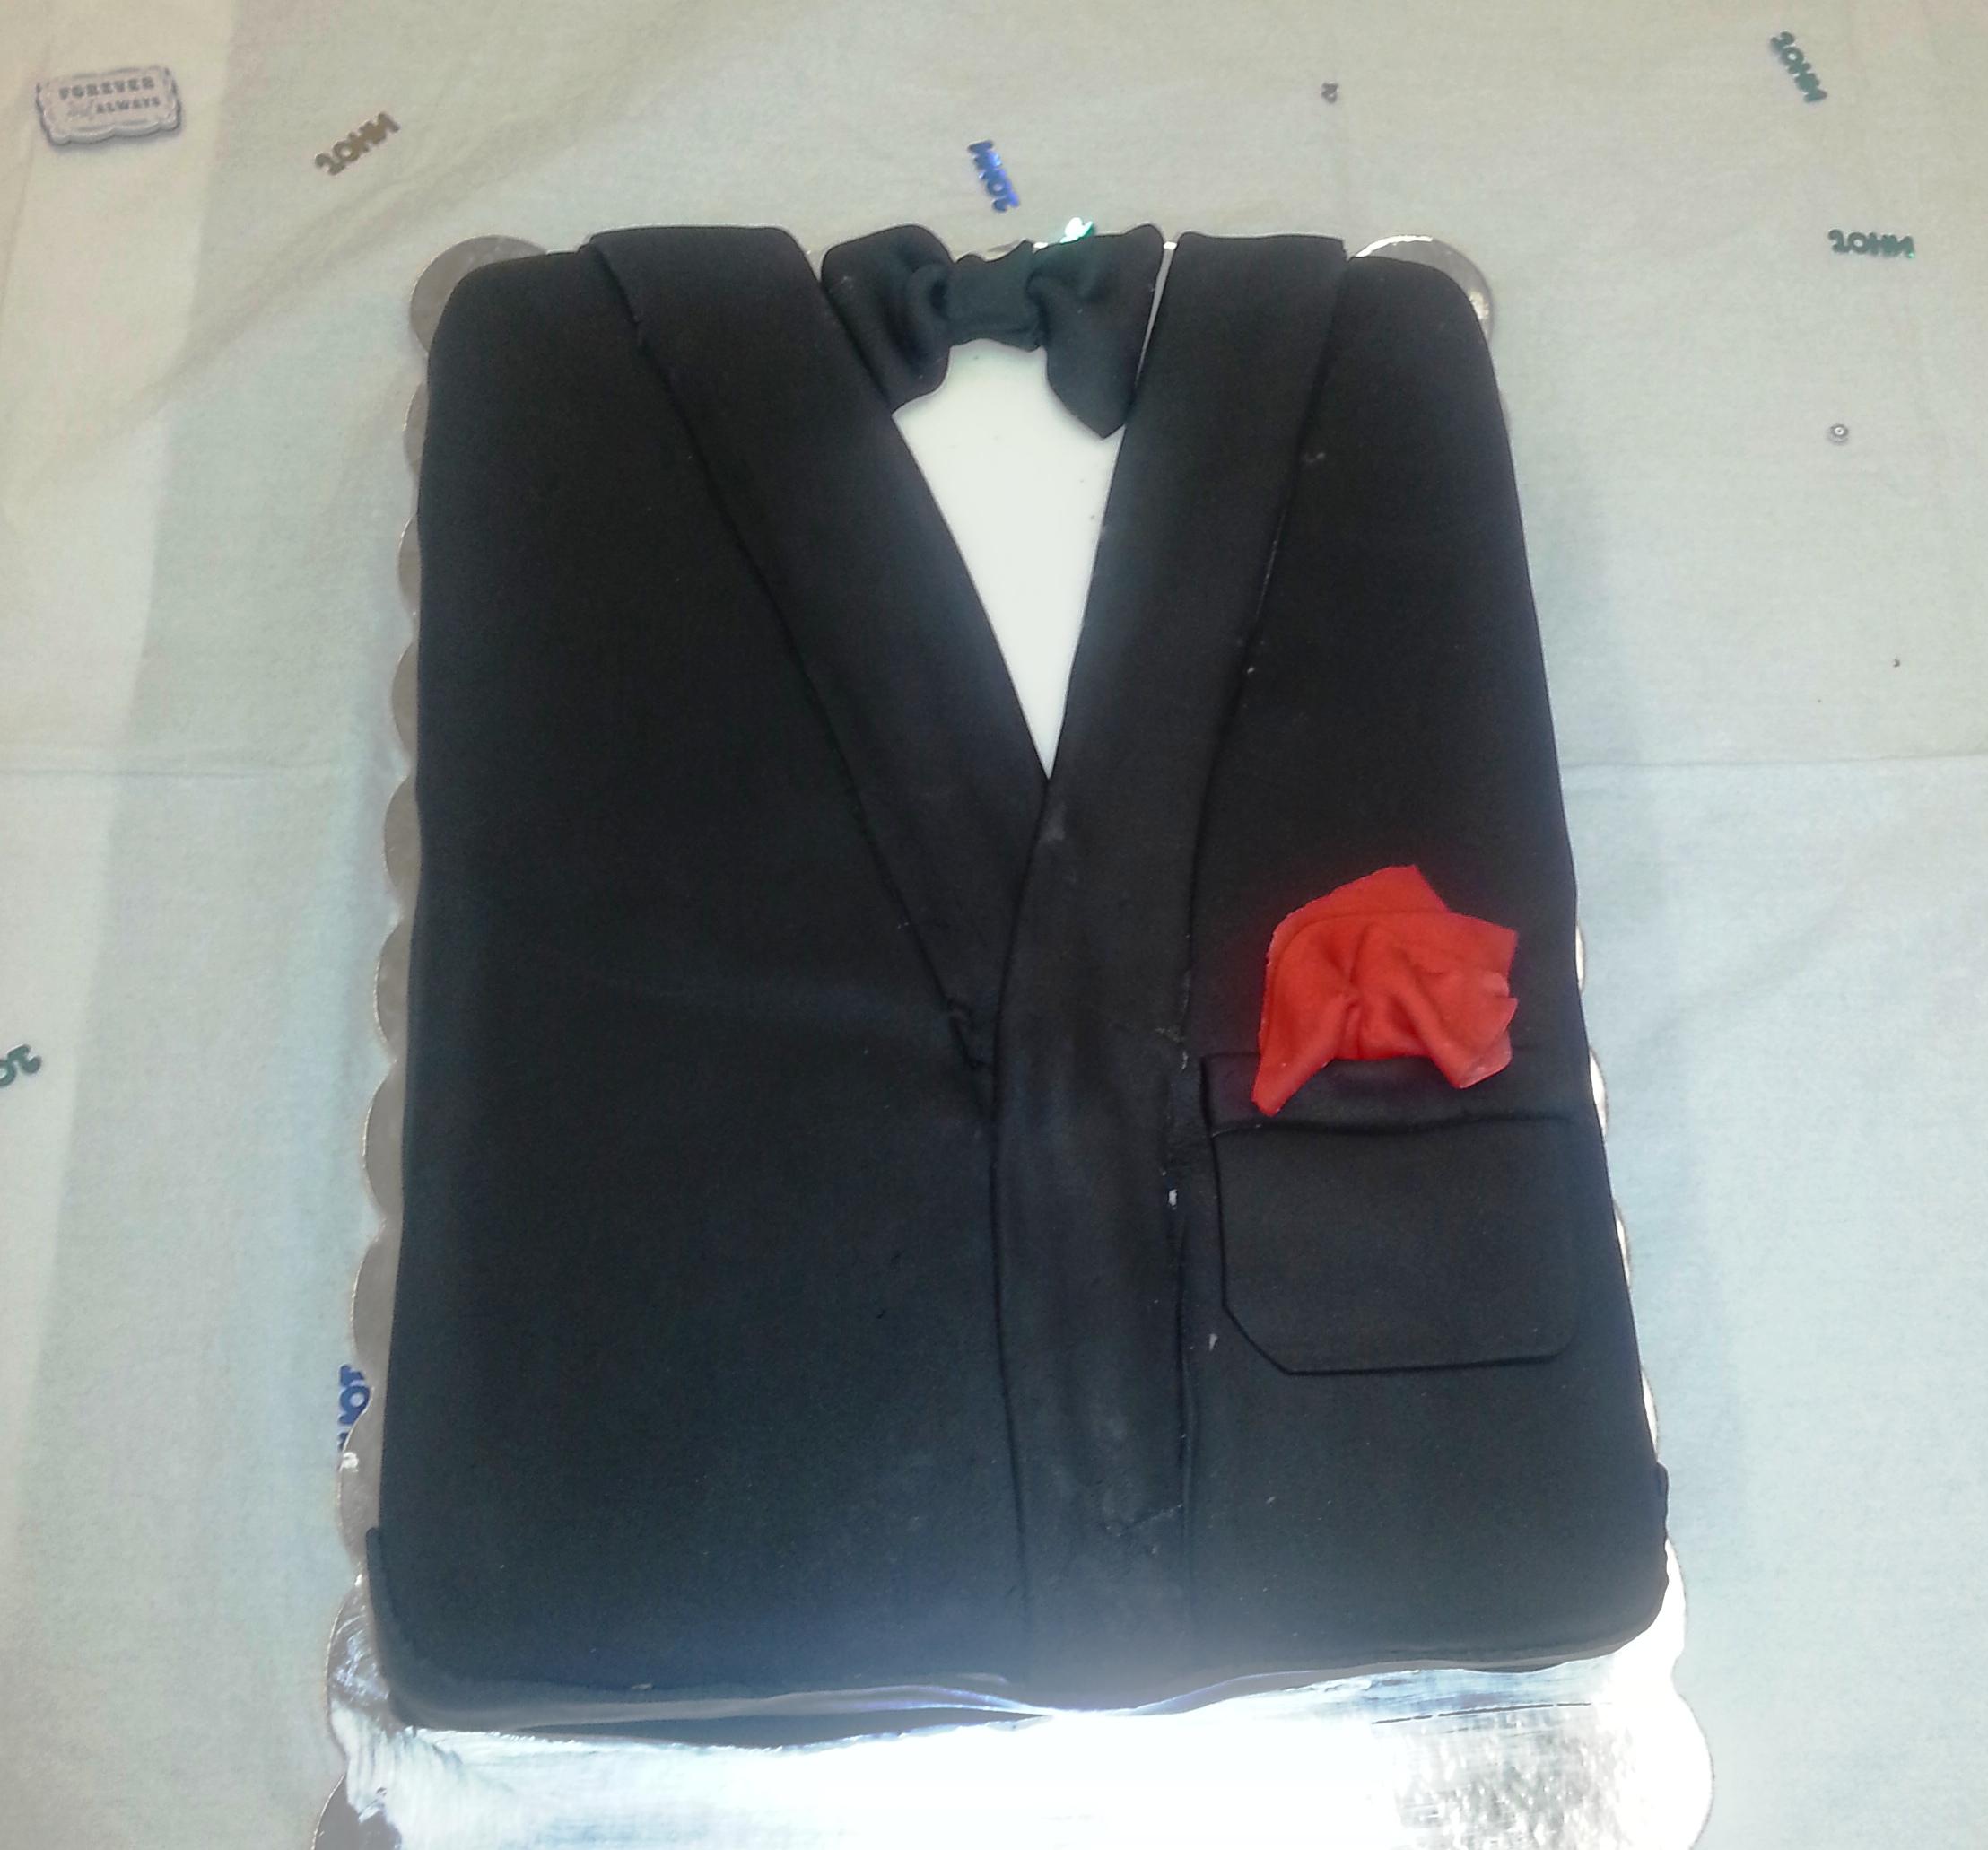 wedding chair covers reddit es robbins mat for hard floors grooms shower cake queenie cakes